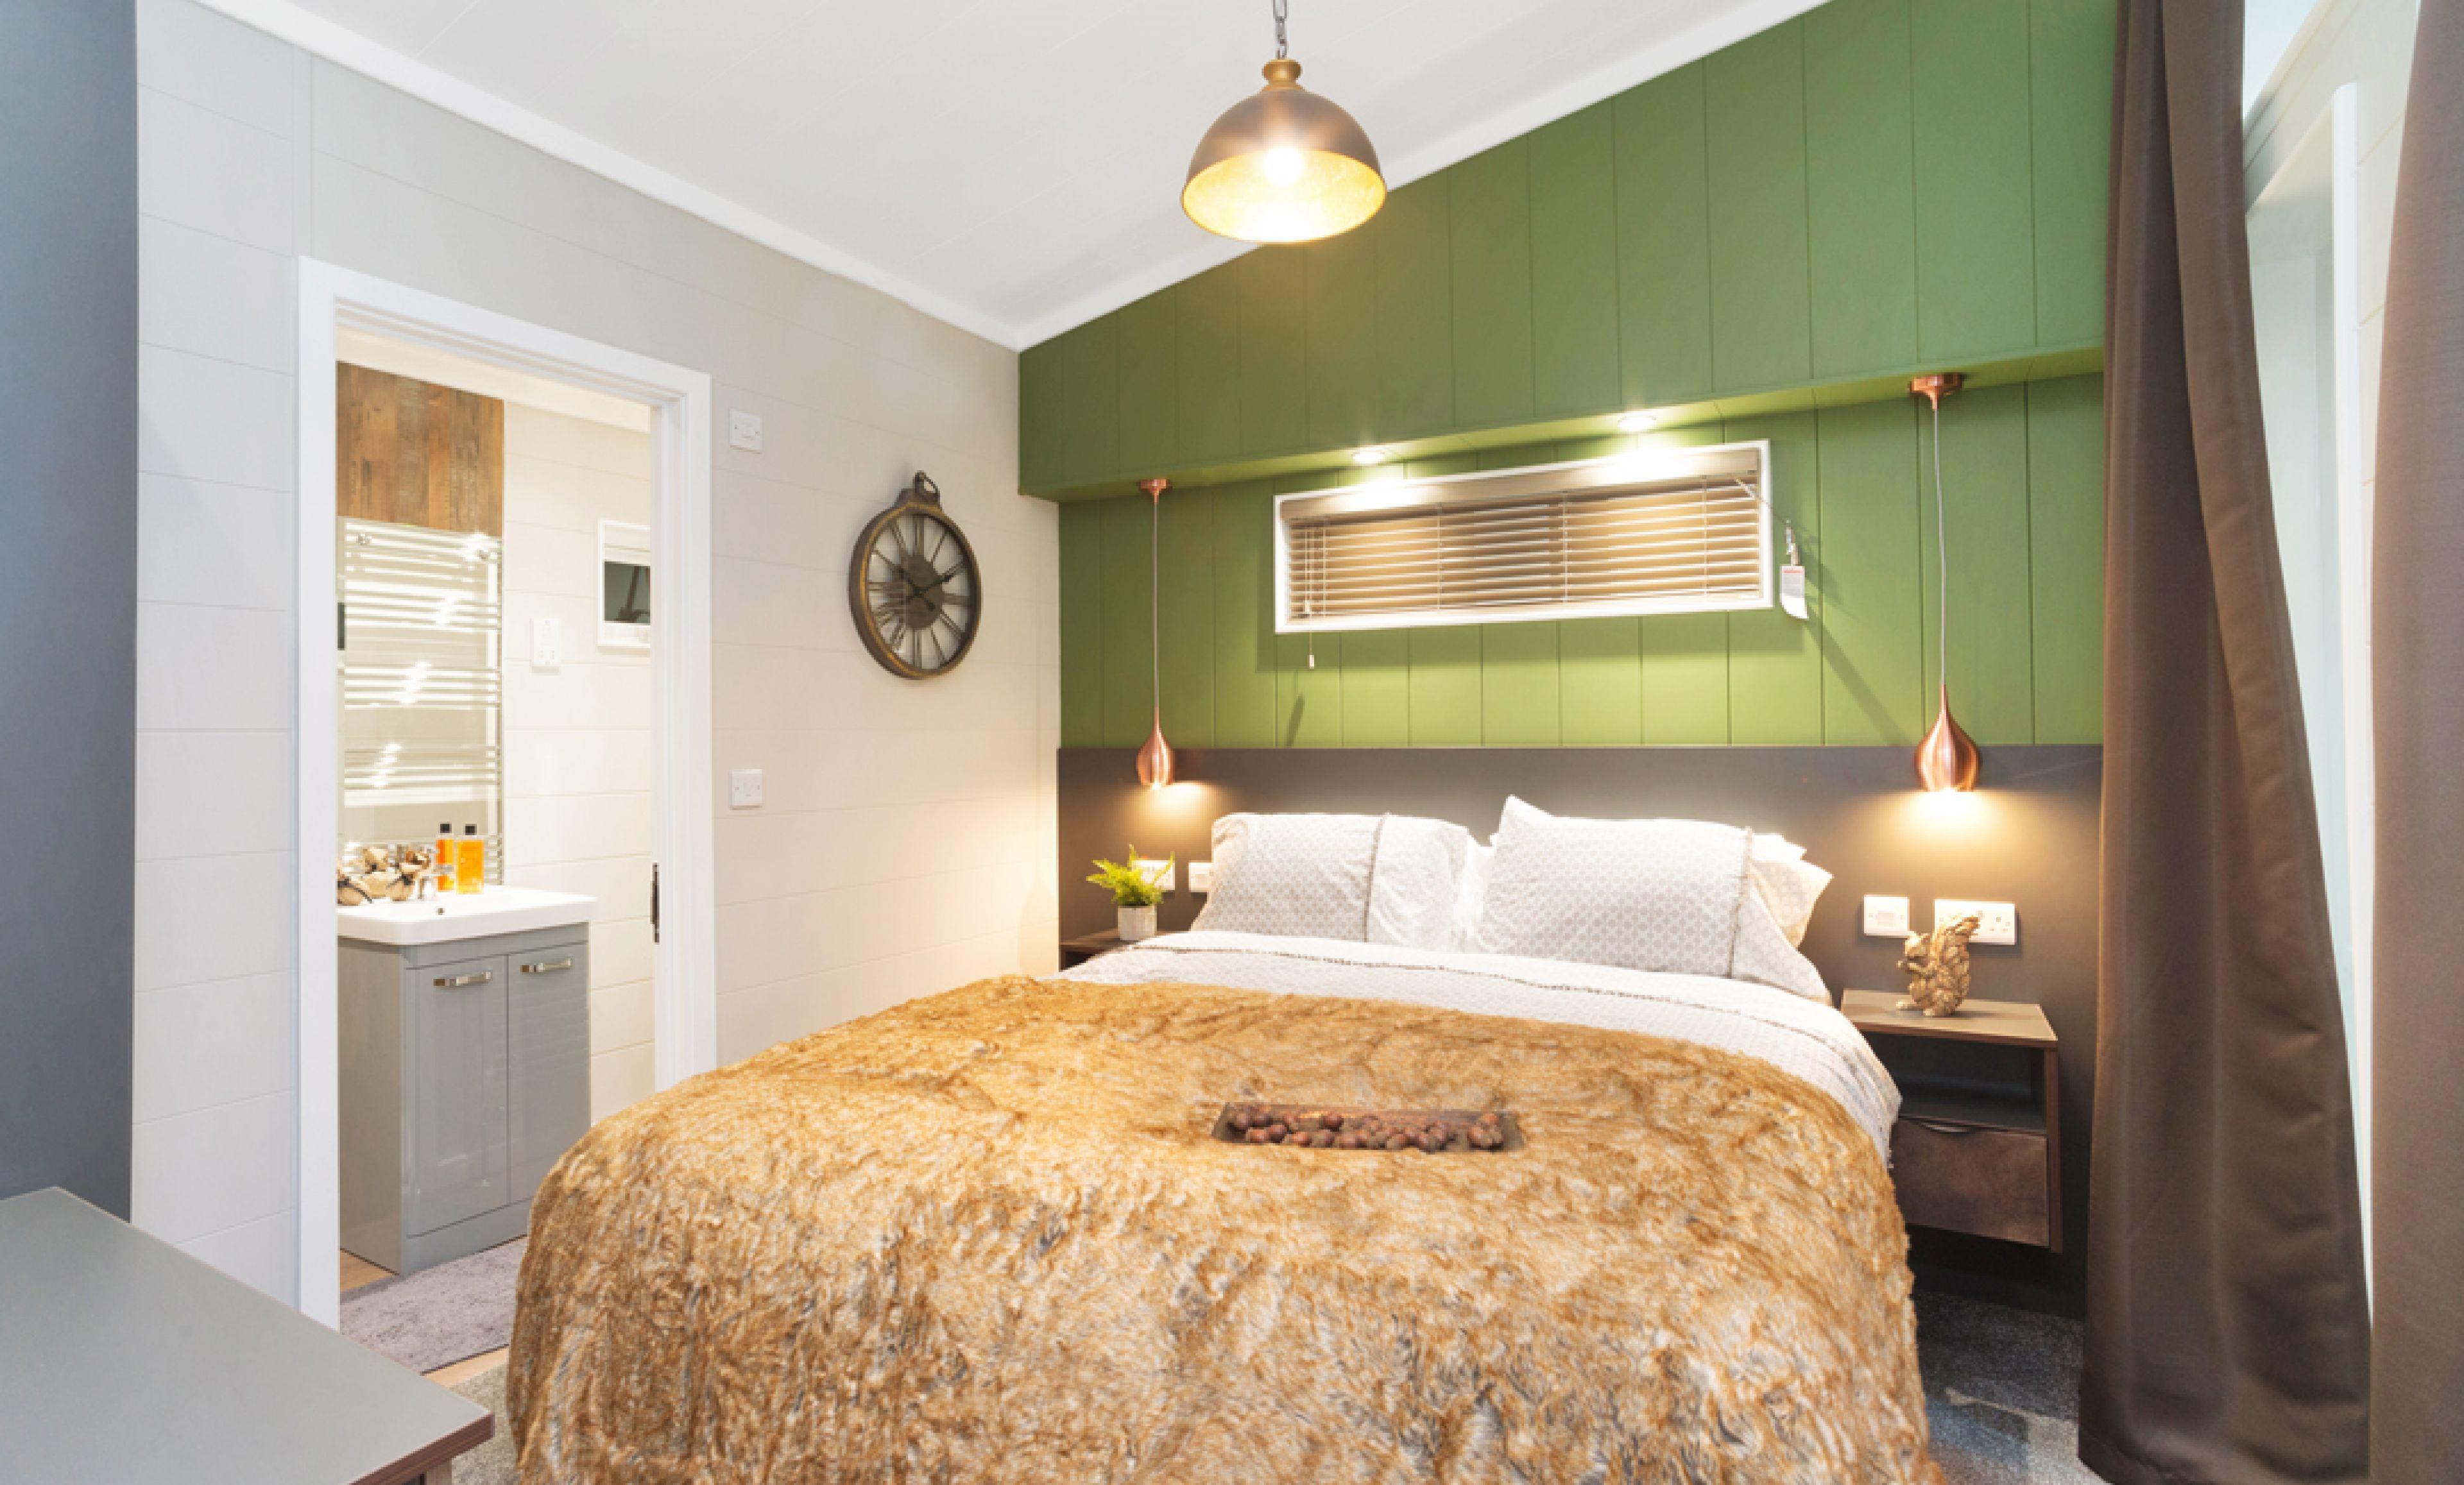 The Savannah Centre Lounge - Centre Lounge - Bedroom